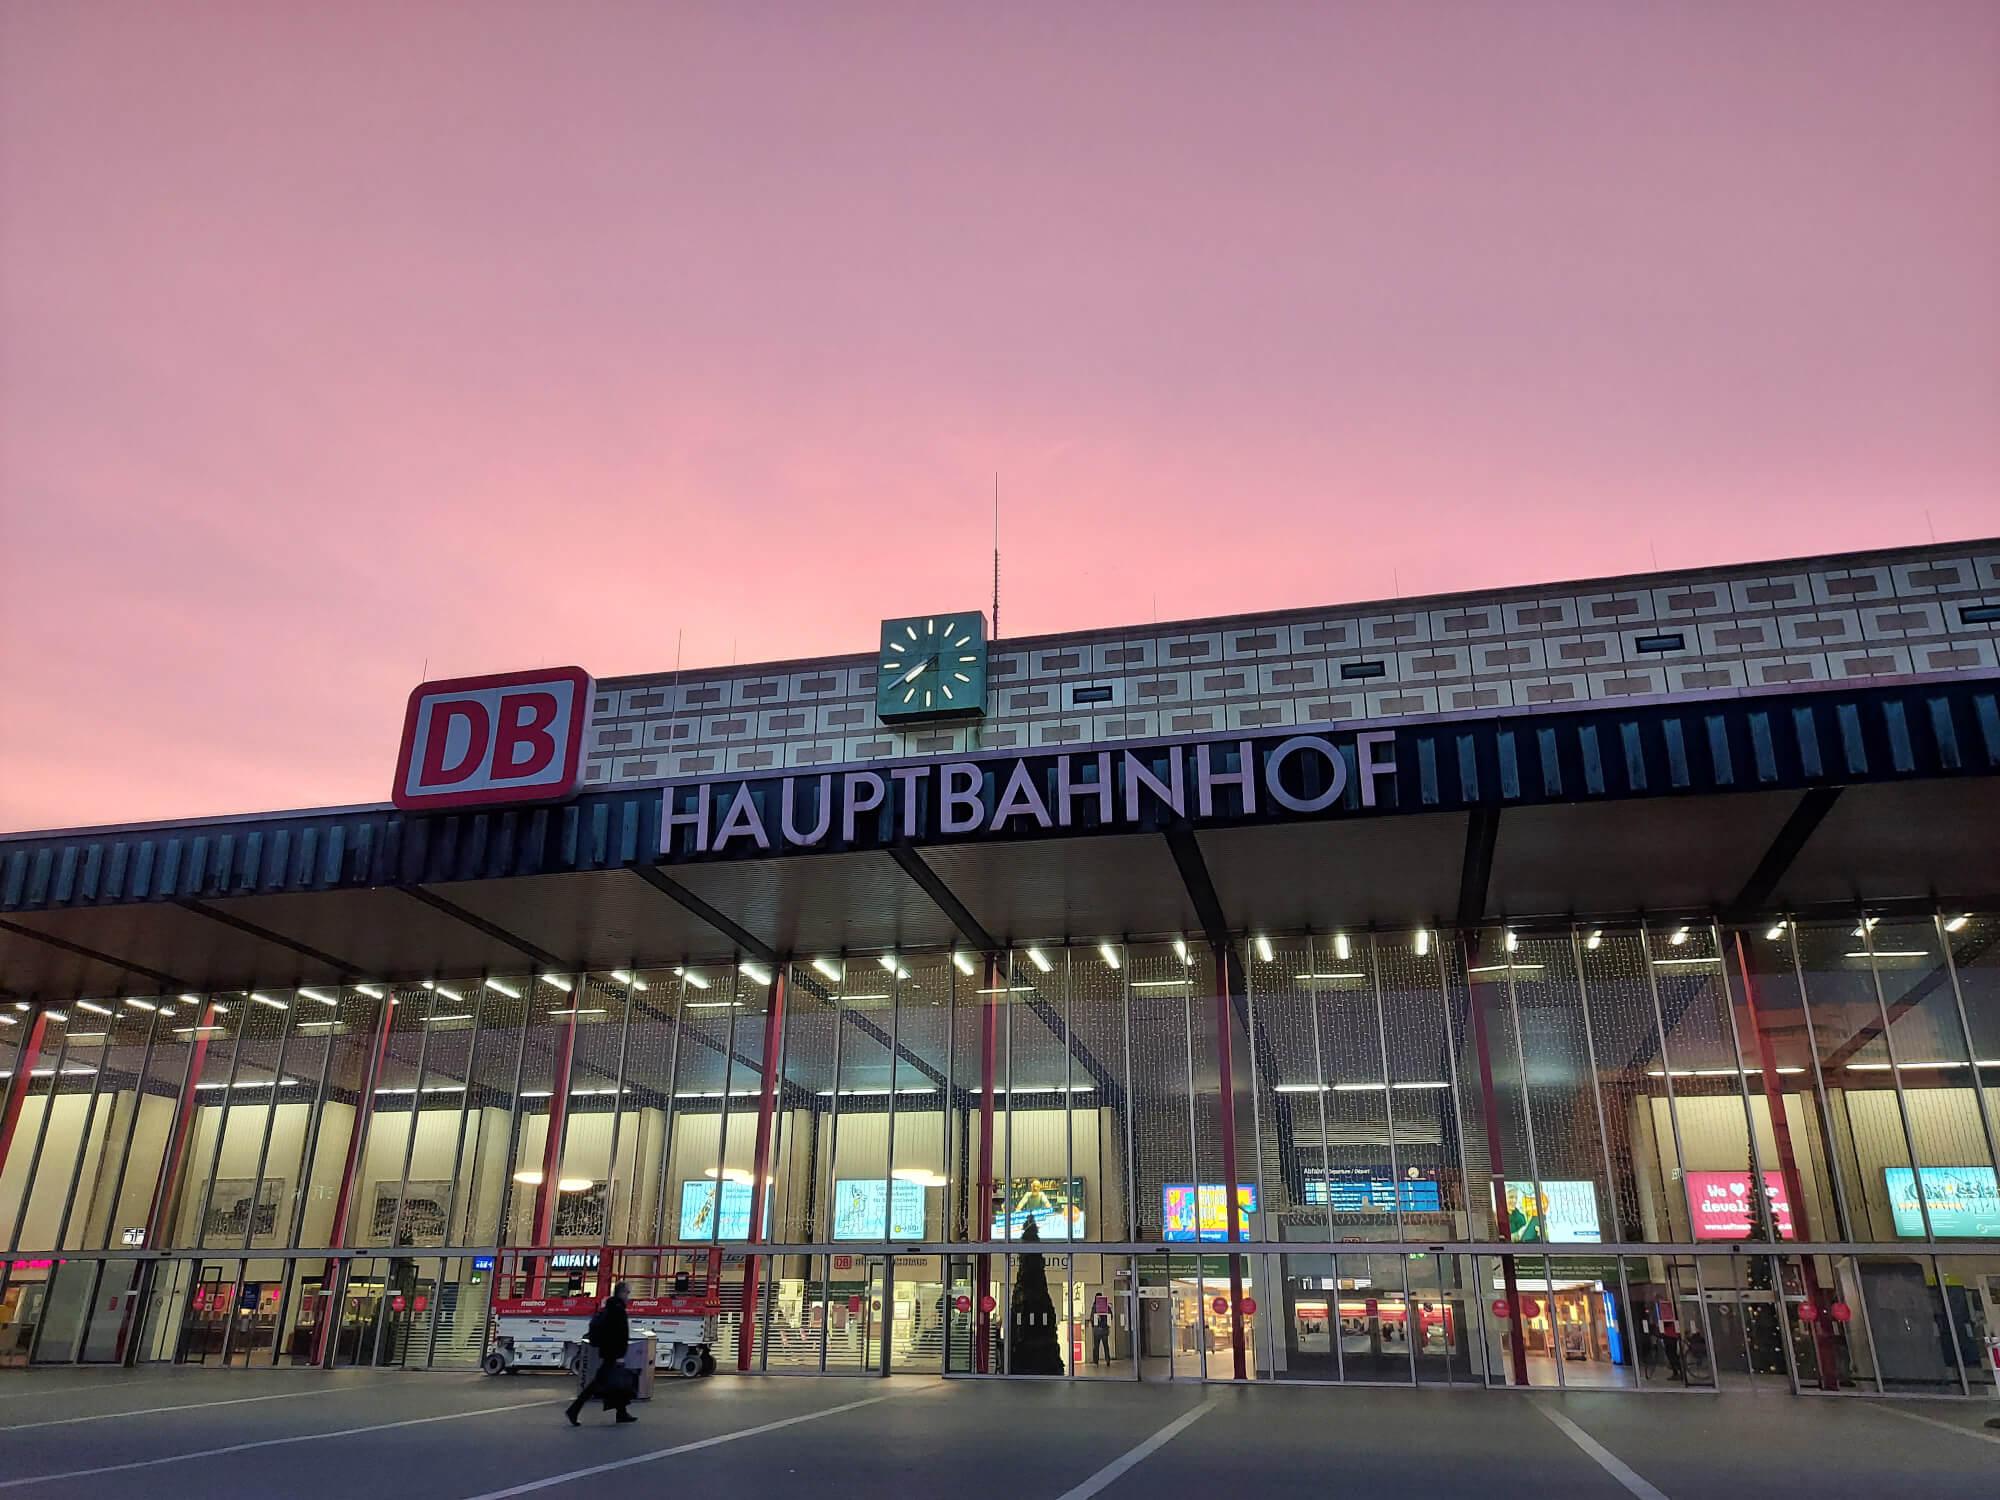 Hauptbahnhof / main train station